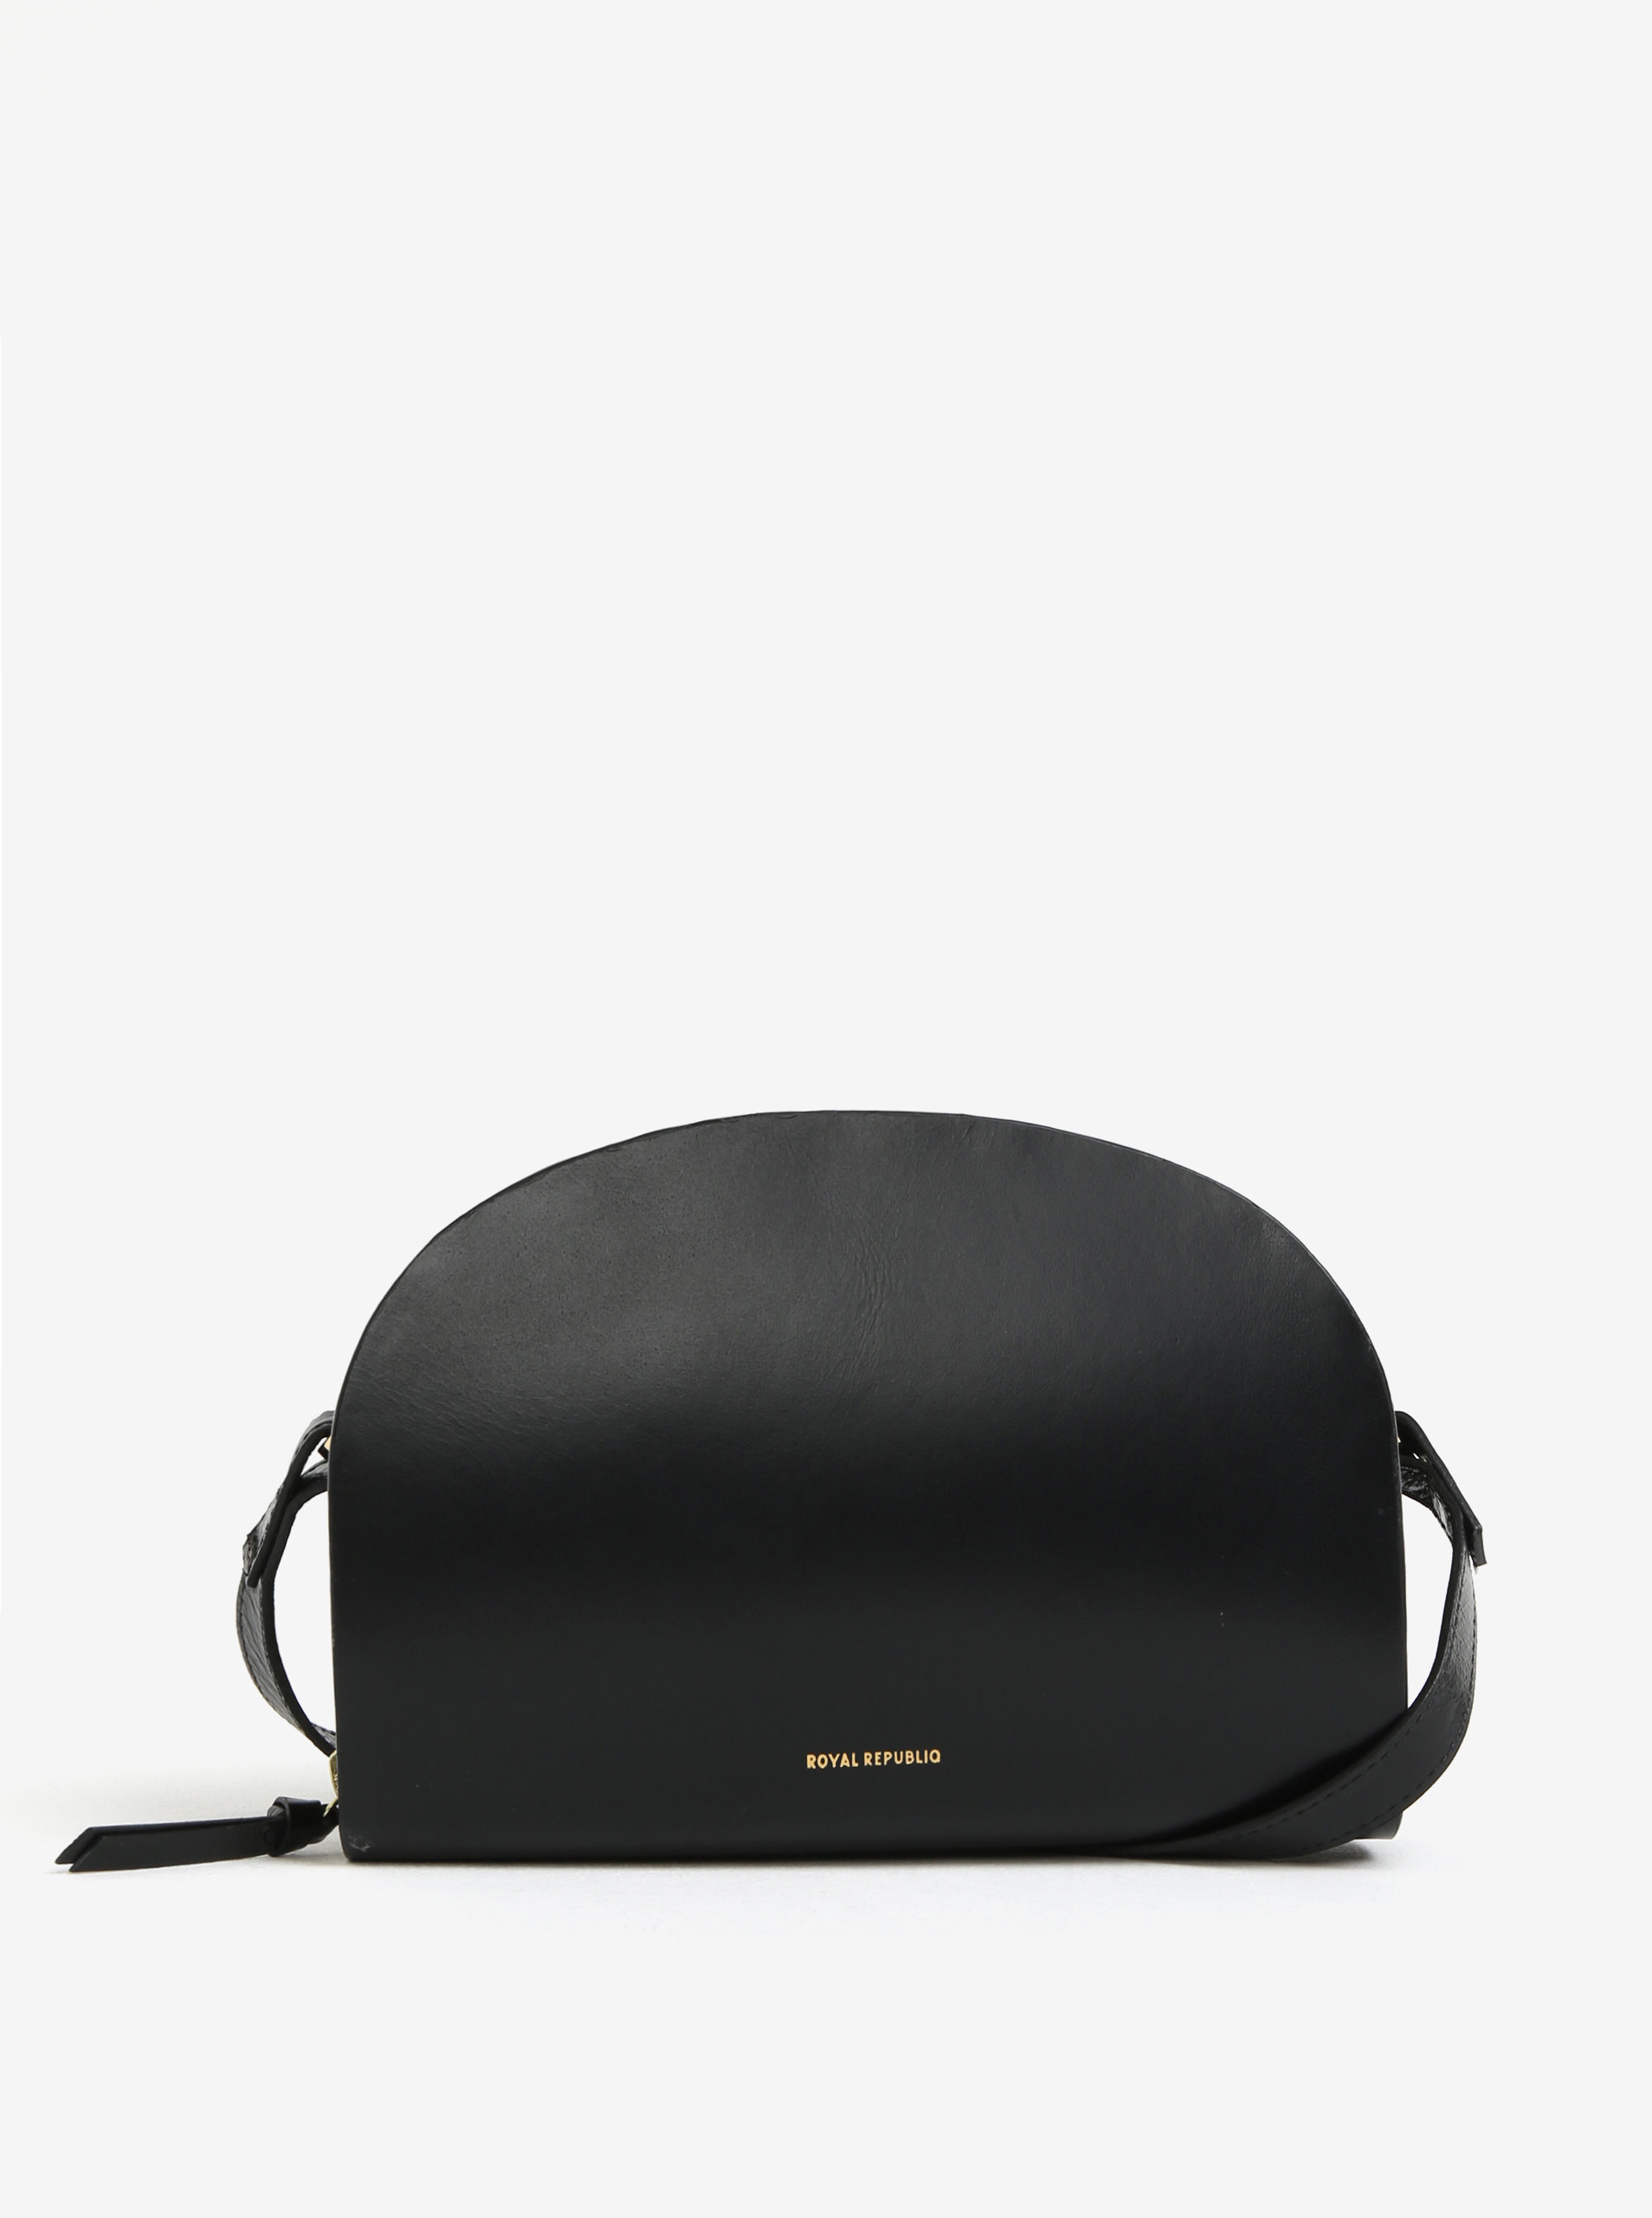 Černá kožená crossbody kabelka Royal RepubliQ Galax Curve ... ed727bca002